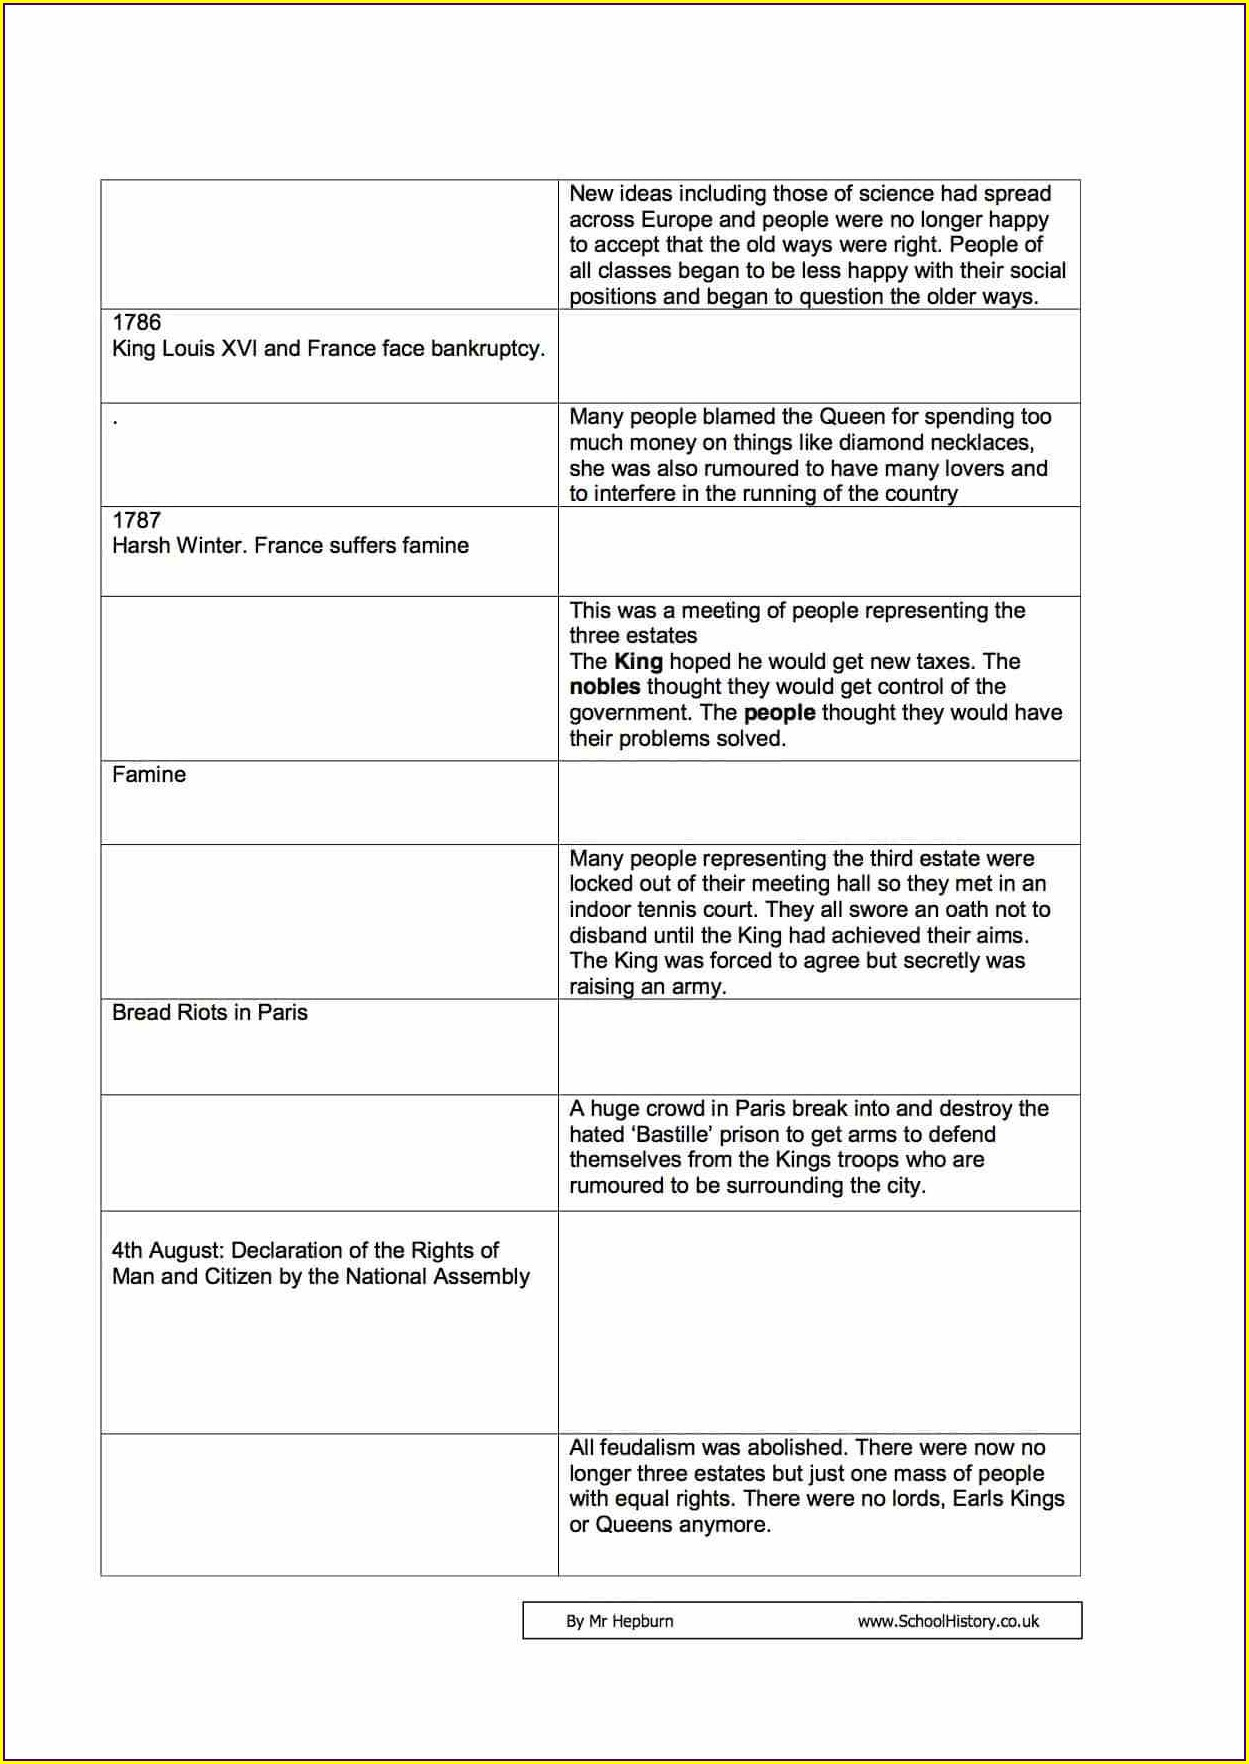 French Revolution Timeline Worksheet Pdf